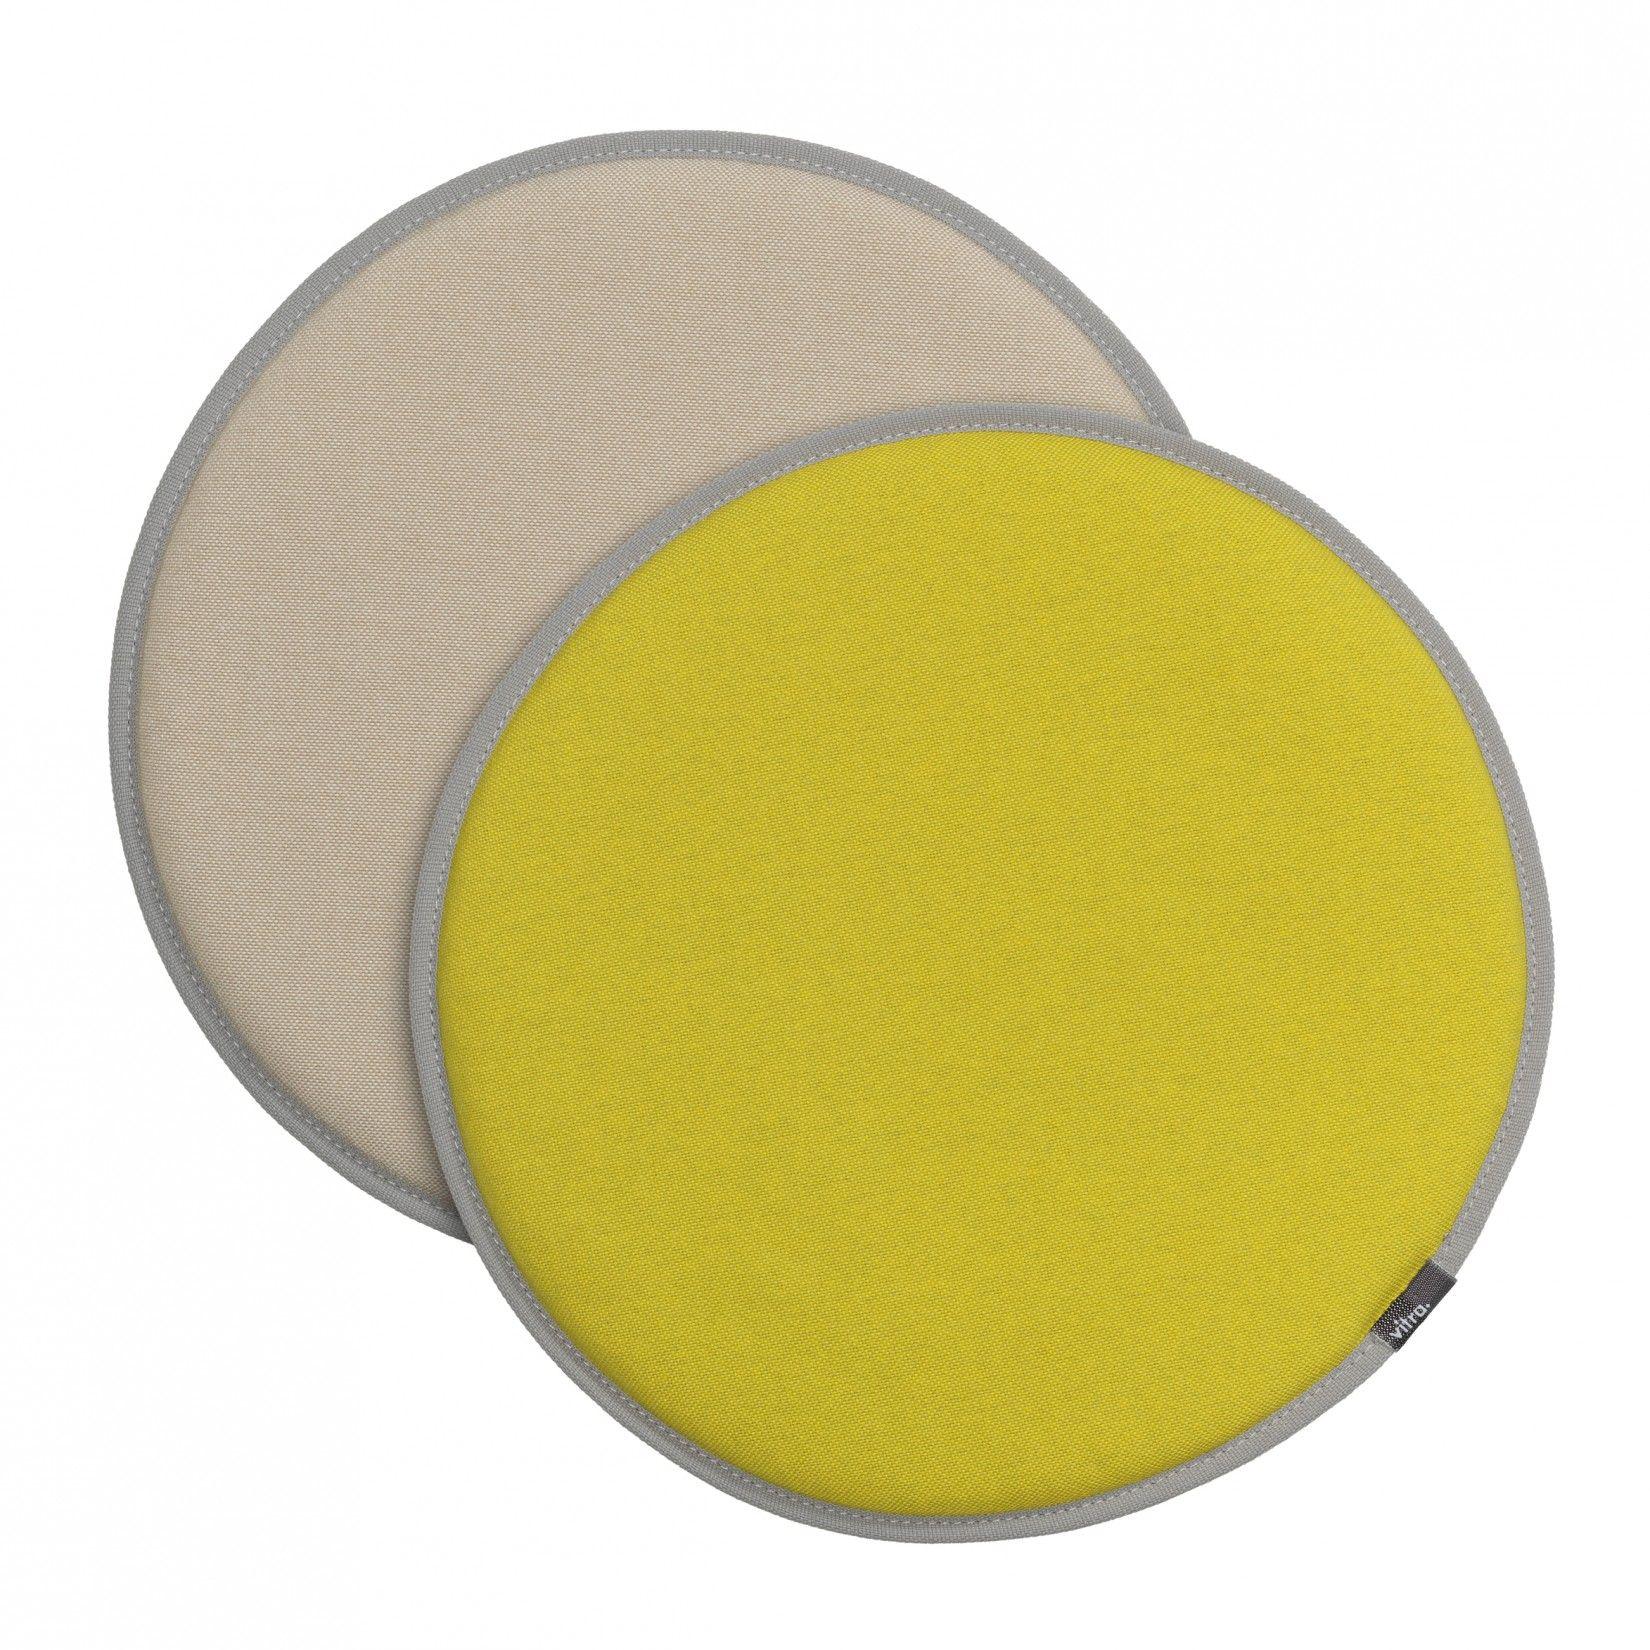 Vitra Seat Dot geel/pastelgroen - perkament/crème  SHOP ONLINE: https://www.purelifestyle.be/home-office/decoratie/textiel/kussens/vitra-seat-dot-geel-pastelgroen-perkament-creme.html